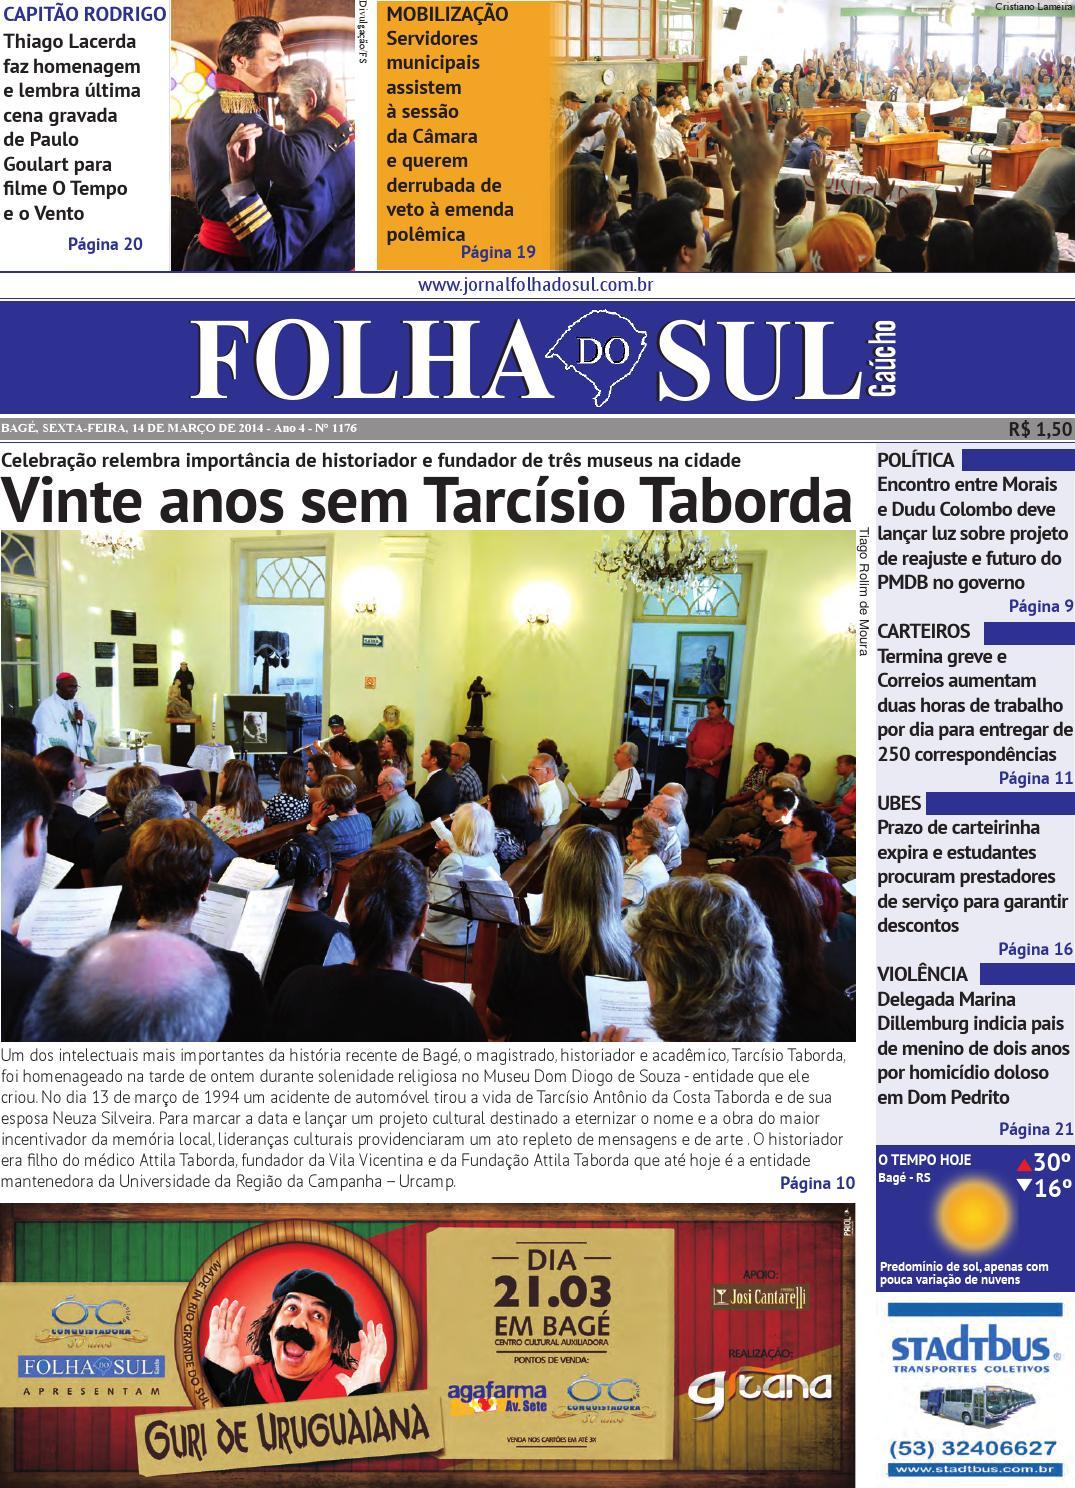 5c23a2df648 Folha do Sul Gaúcho Ed. 1177 (14 03 2014) by Folha do Sul Gaúcho - issuu